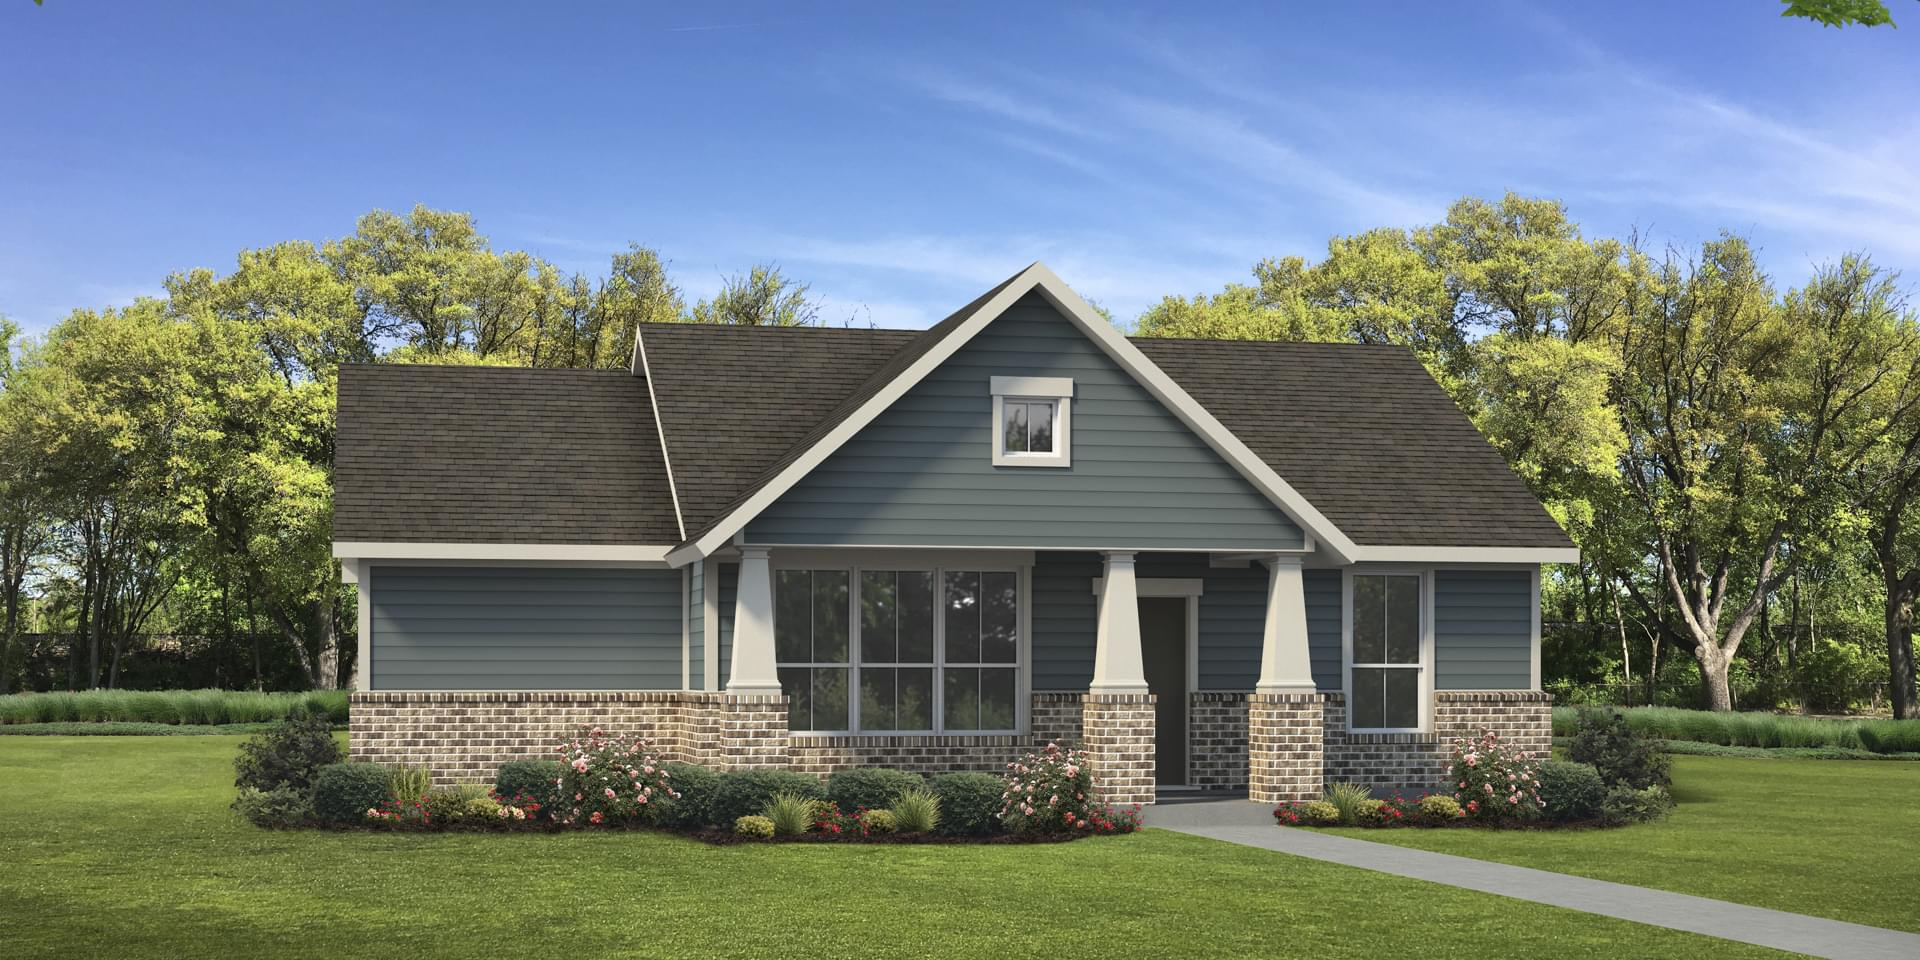 The San Antonio Custom Home Plan from Tilson Homes